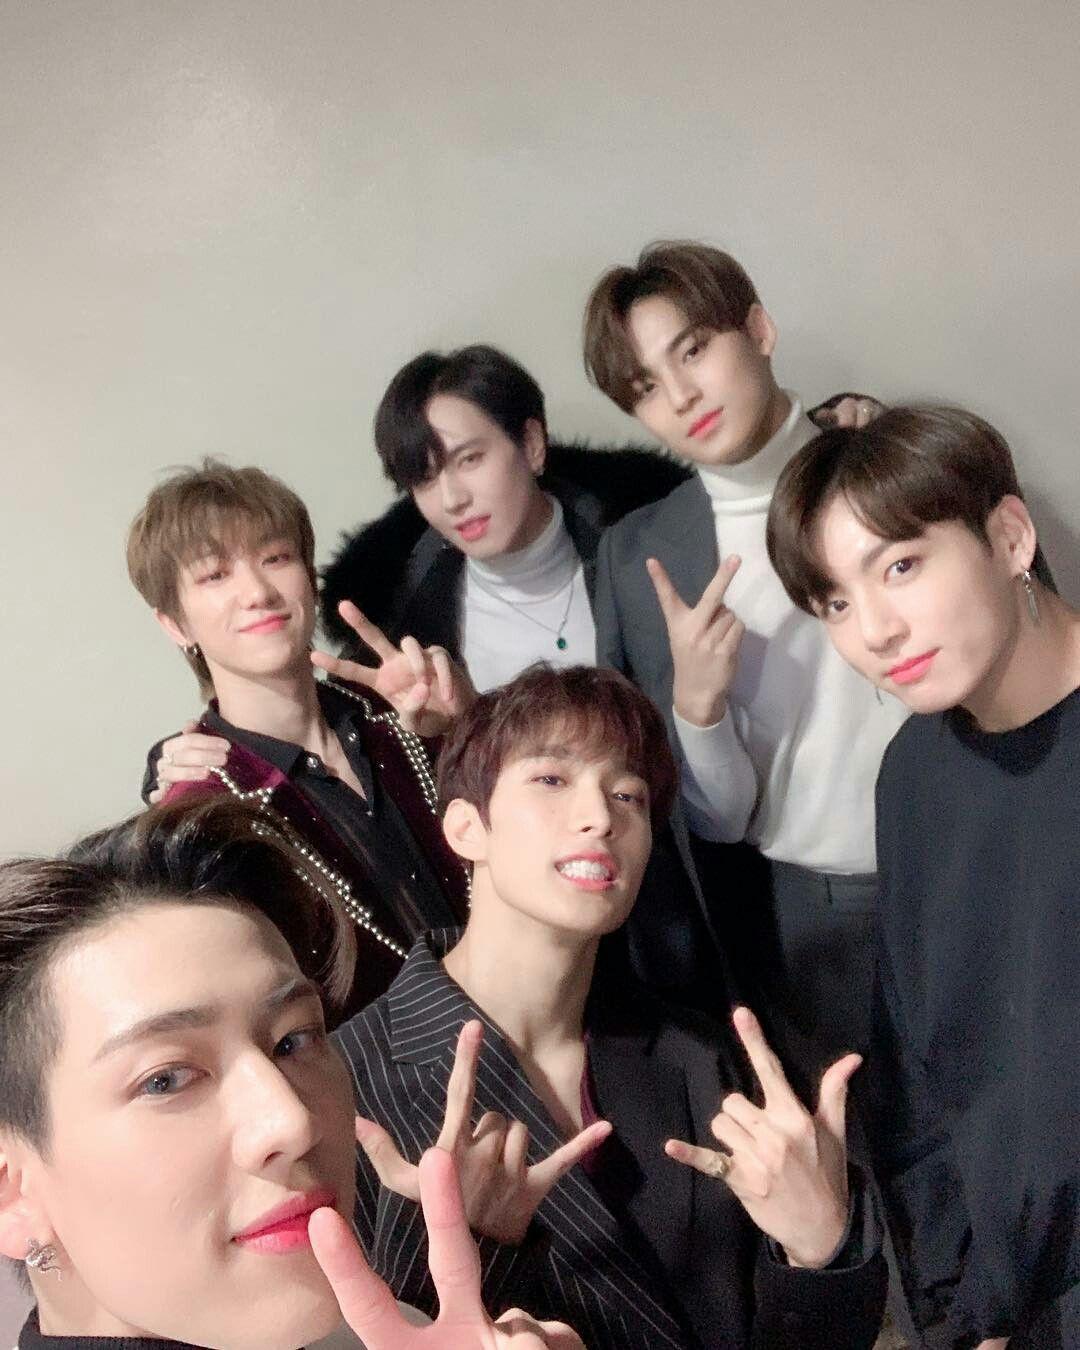 Bts Jungkook With Got7 Bambam Yugyeom Seventeen Mingyu The8